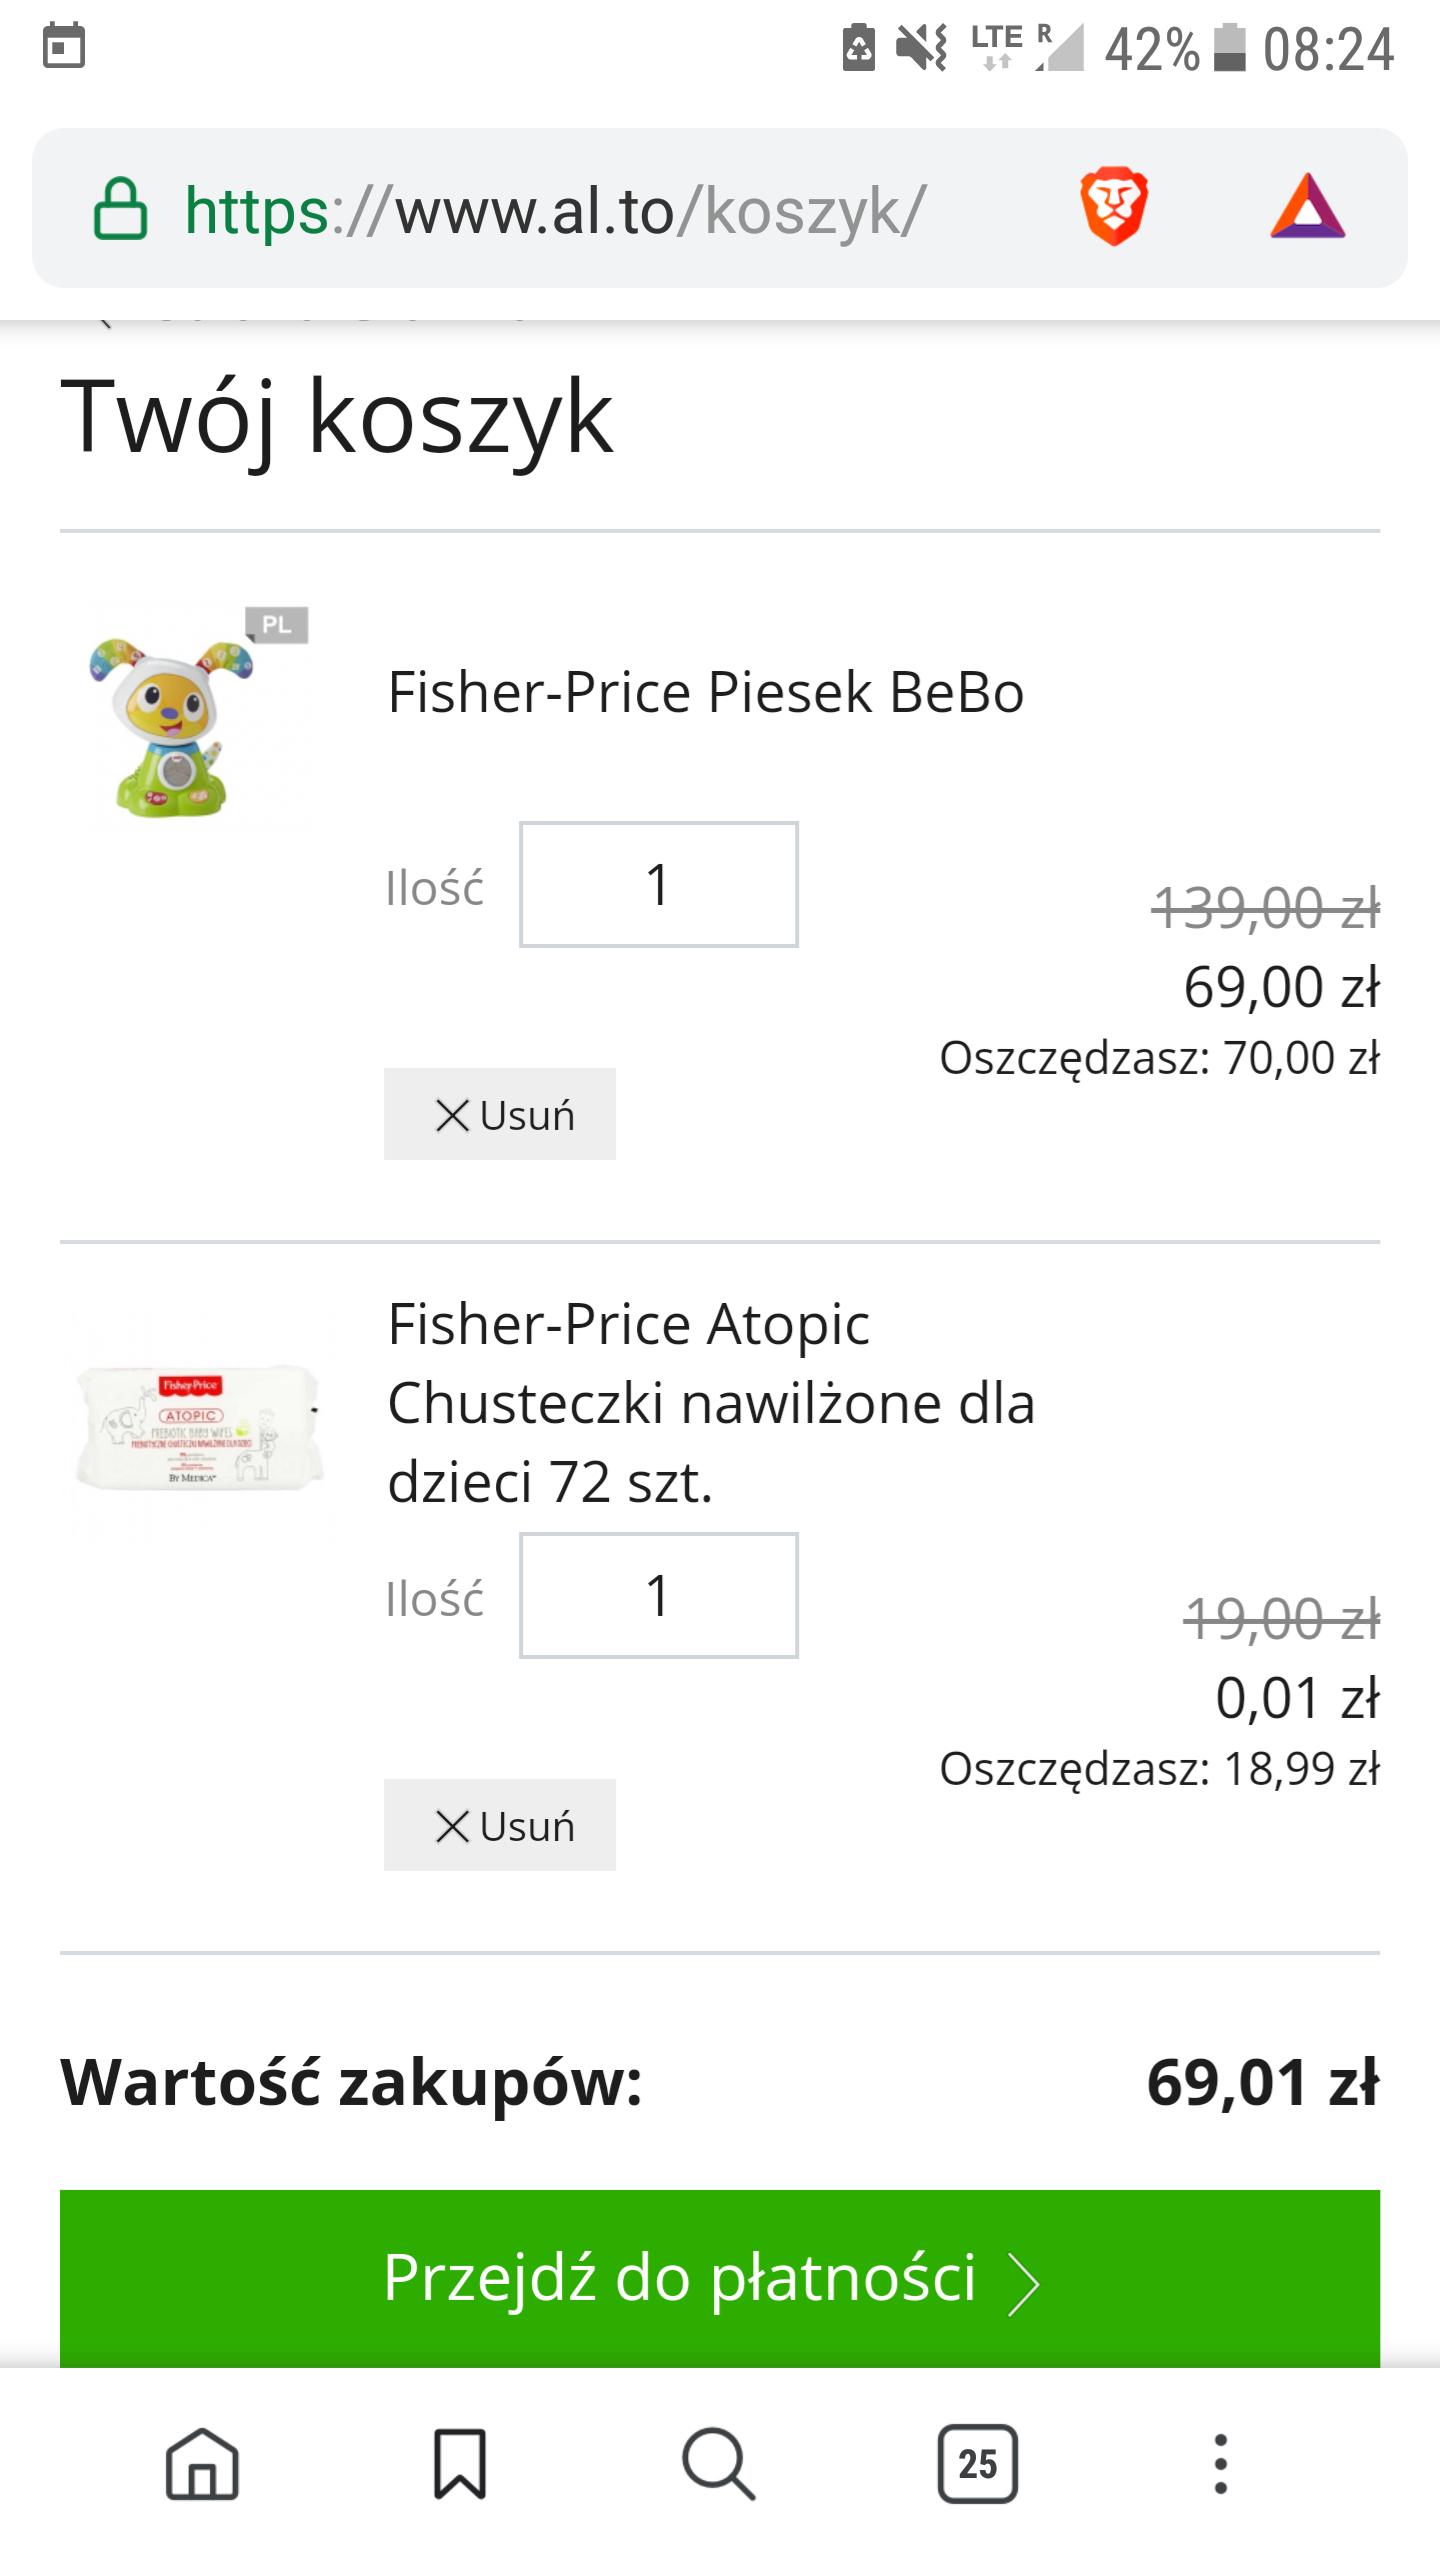 Fisher-Price piesek bebo + chusteczki atopic